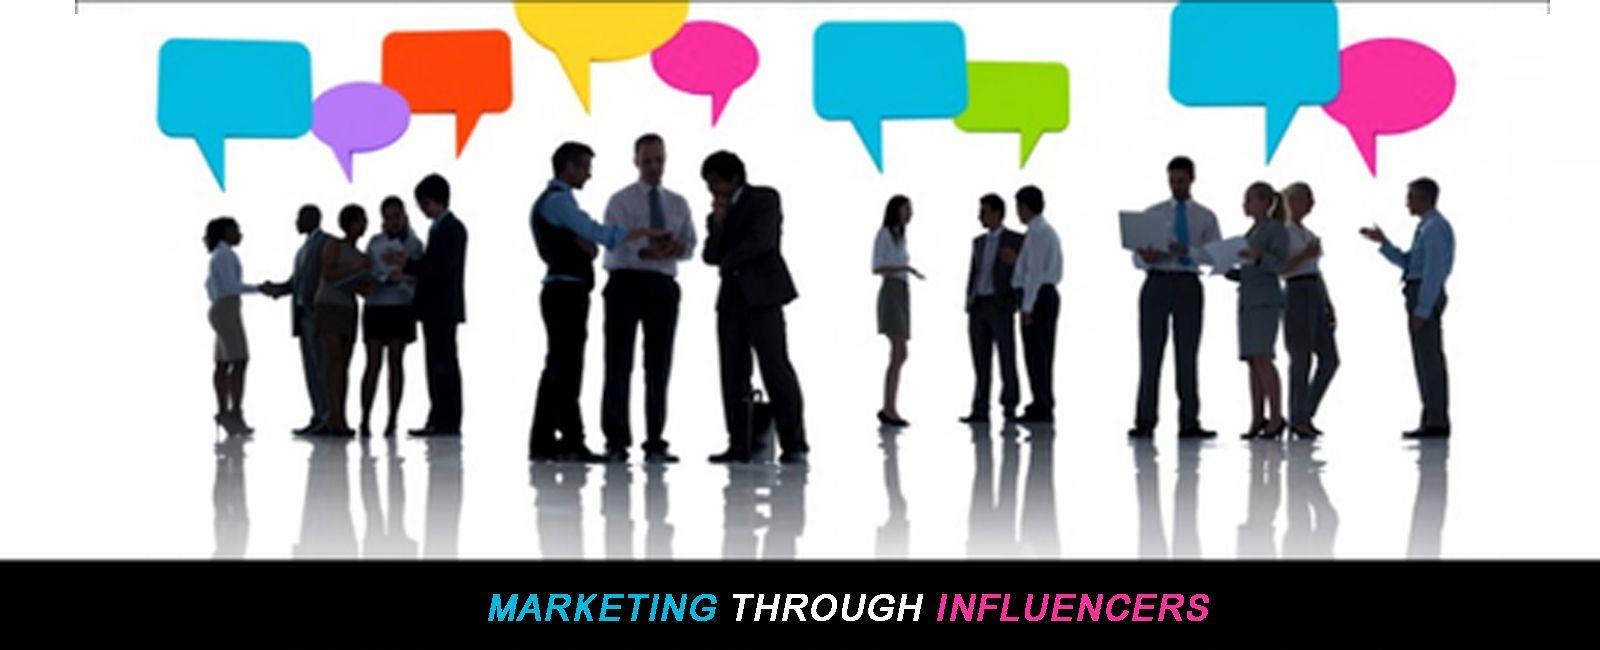 Marketing through Influencers